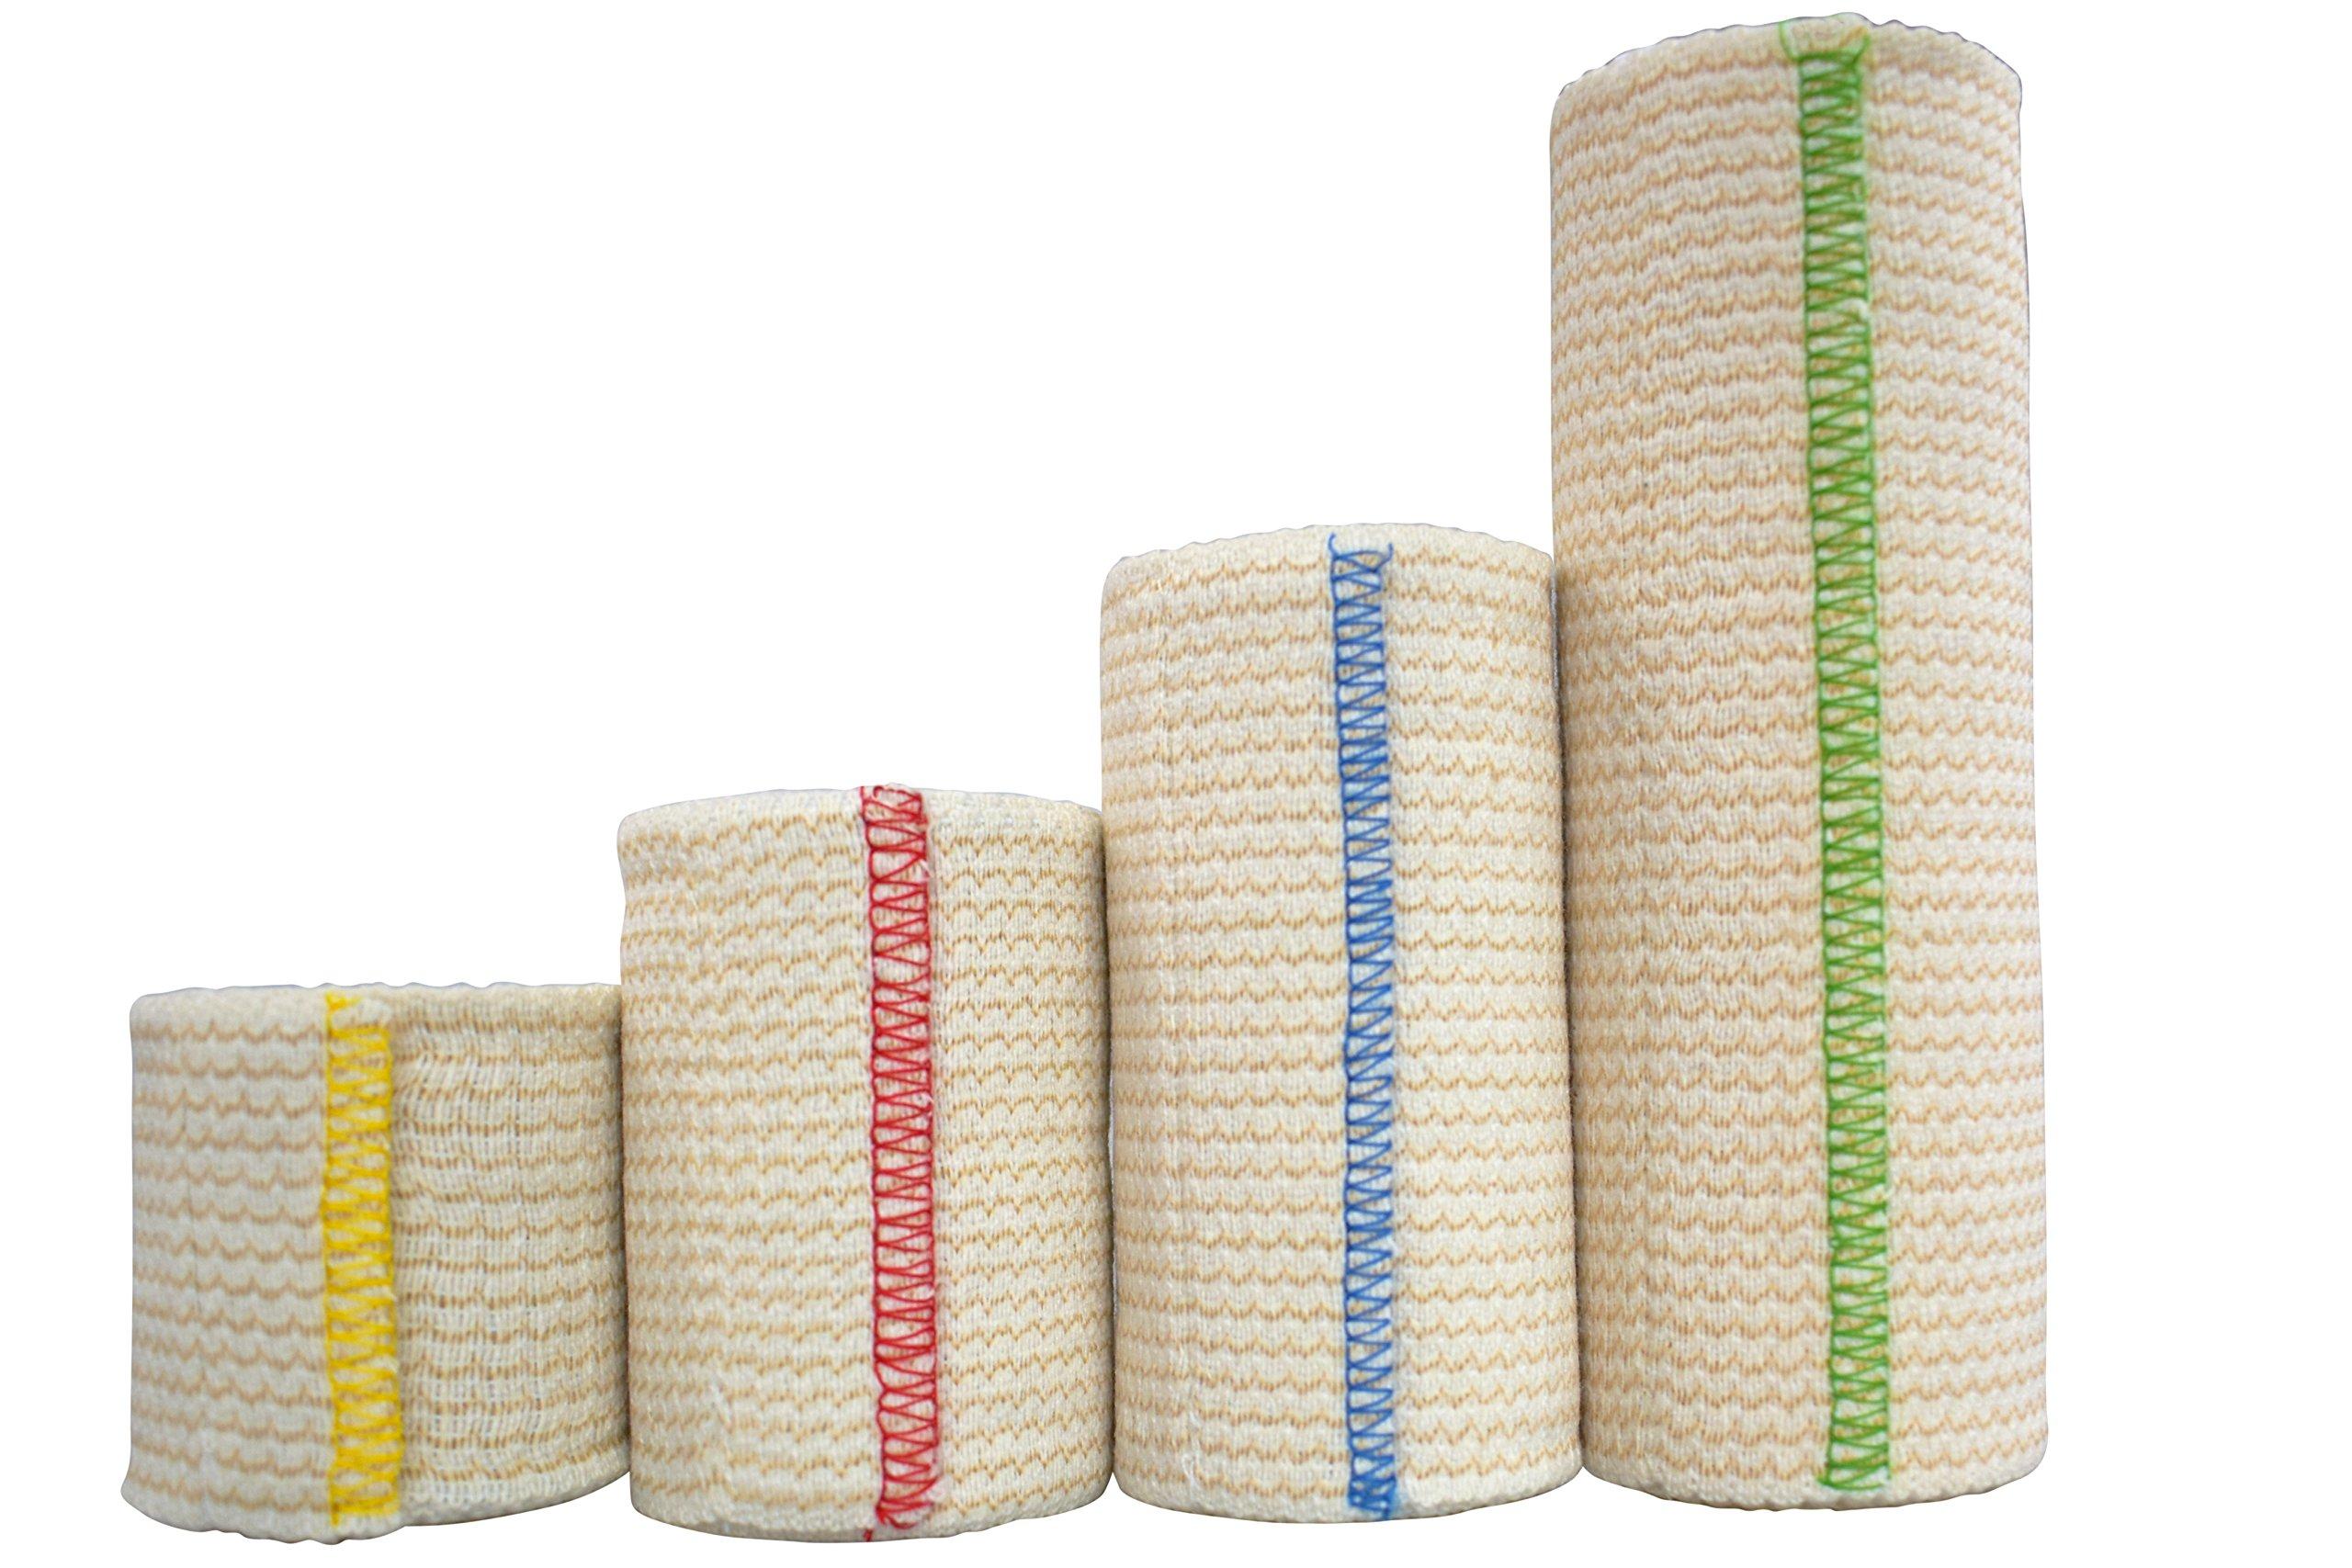 NexSkin Elastic Bandage Compression Wrap w/Hook Loop Closure, Variety - 4 Pack